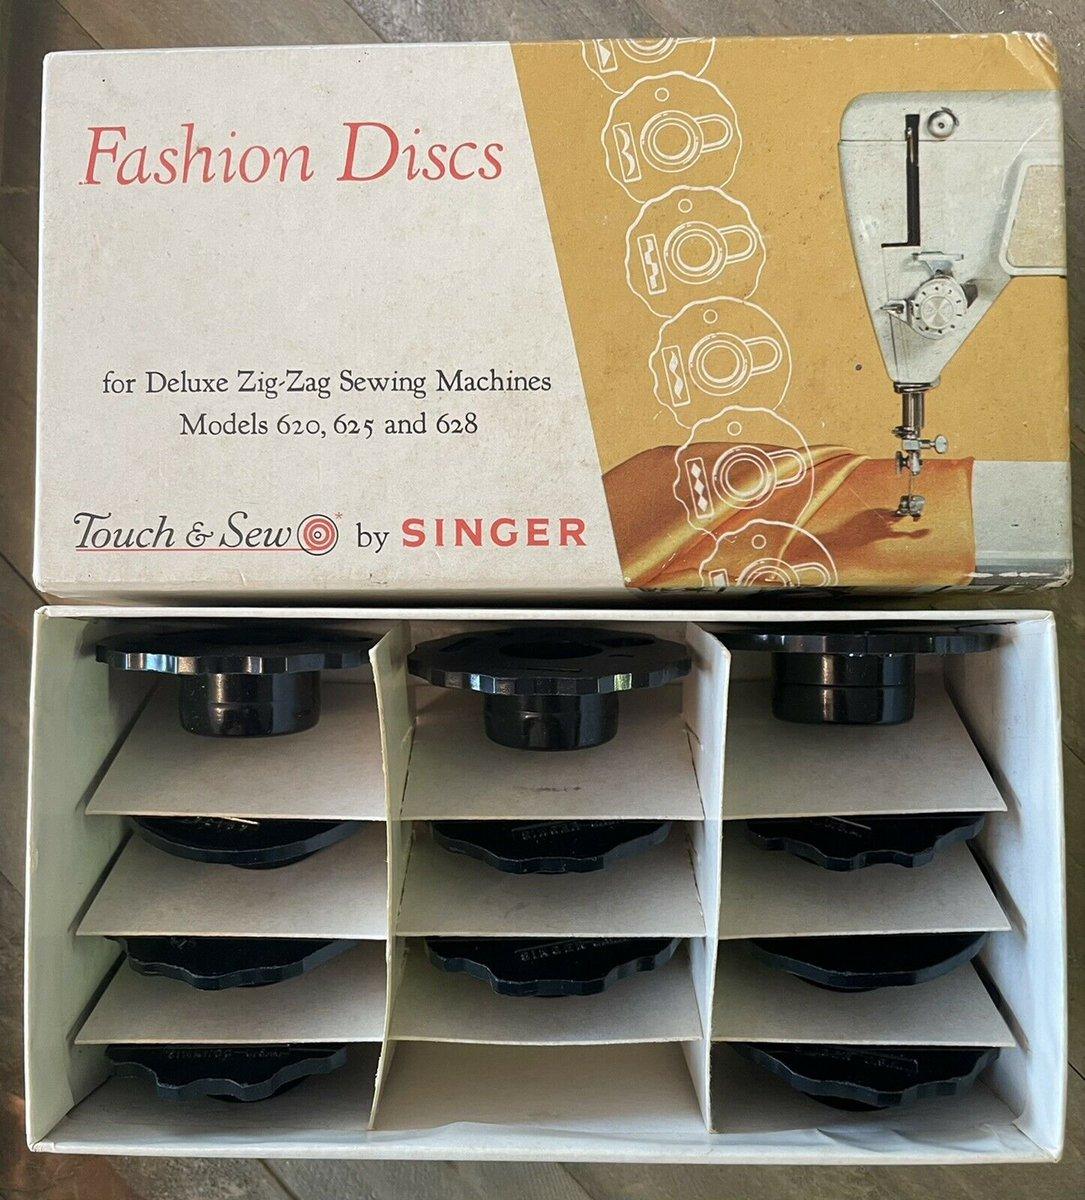 test Twitter Media - Touch & Sew By Singer Fashion Discs Models 620 625 628 Deluxe 11 Zig Zag Discs  https://t.co/Tr1JYQ2Md9 https://t.co/rawLsg2OlA